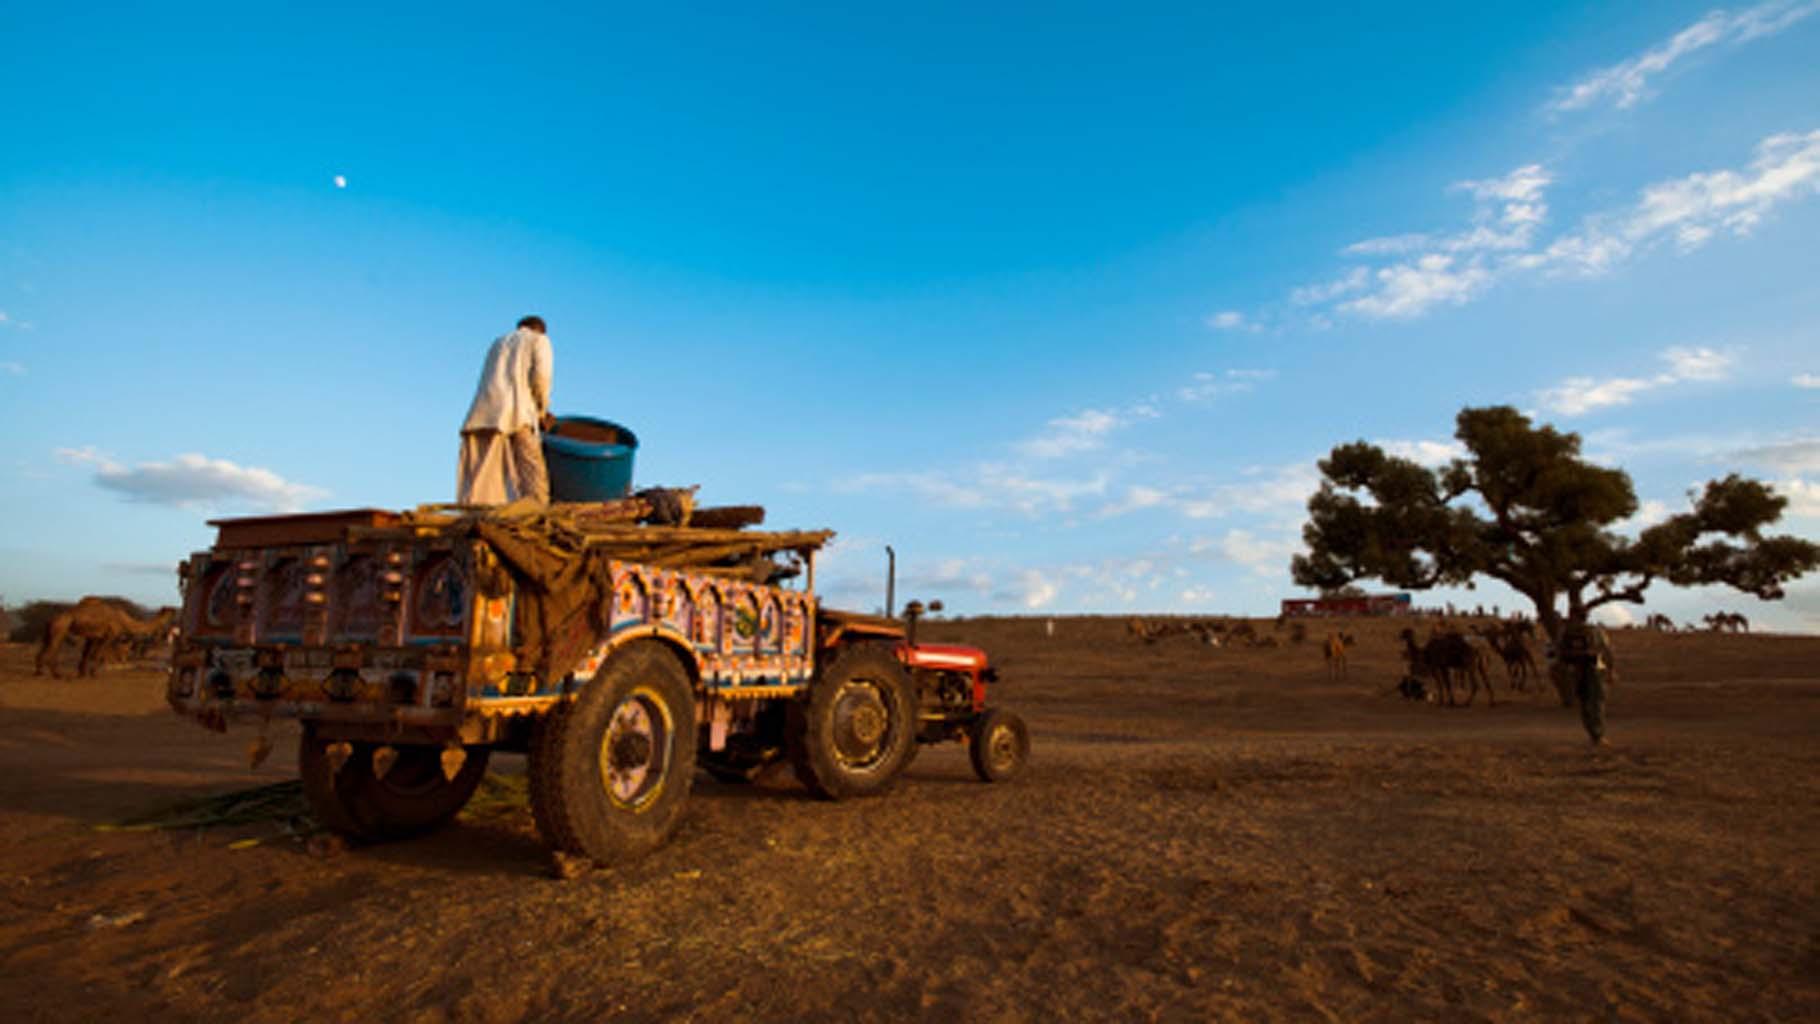 Farmers, Father-son relationship, Tractor trolley, Farming